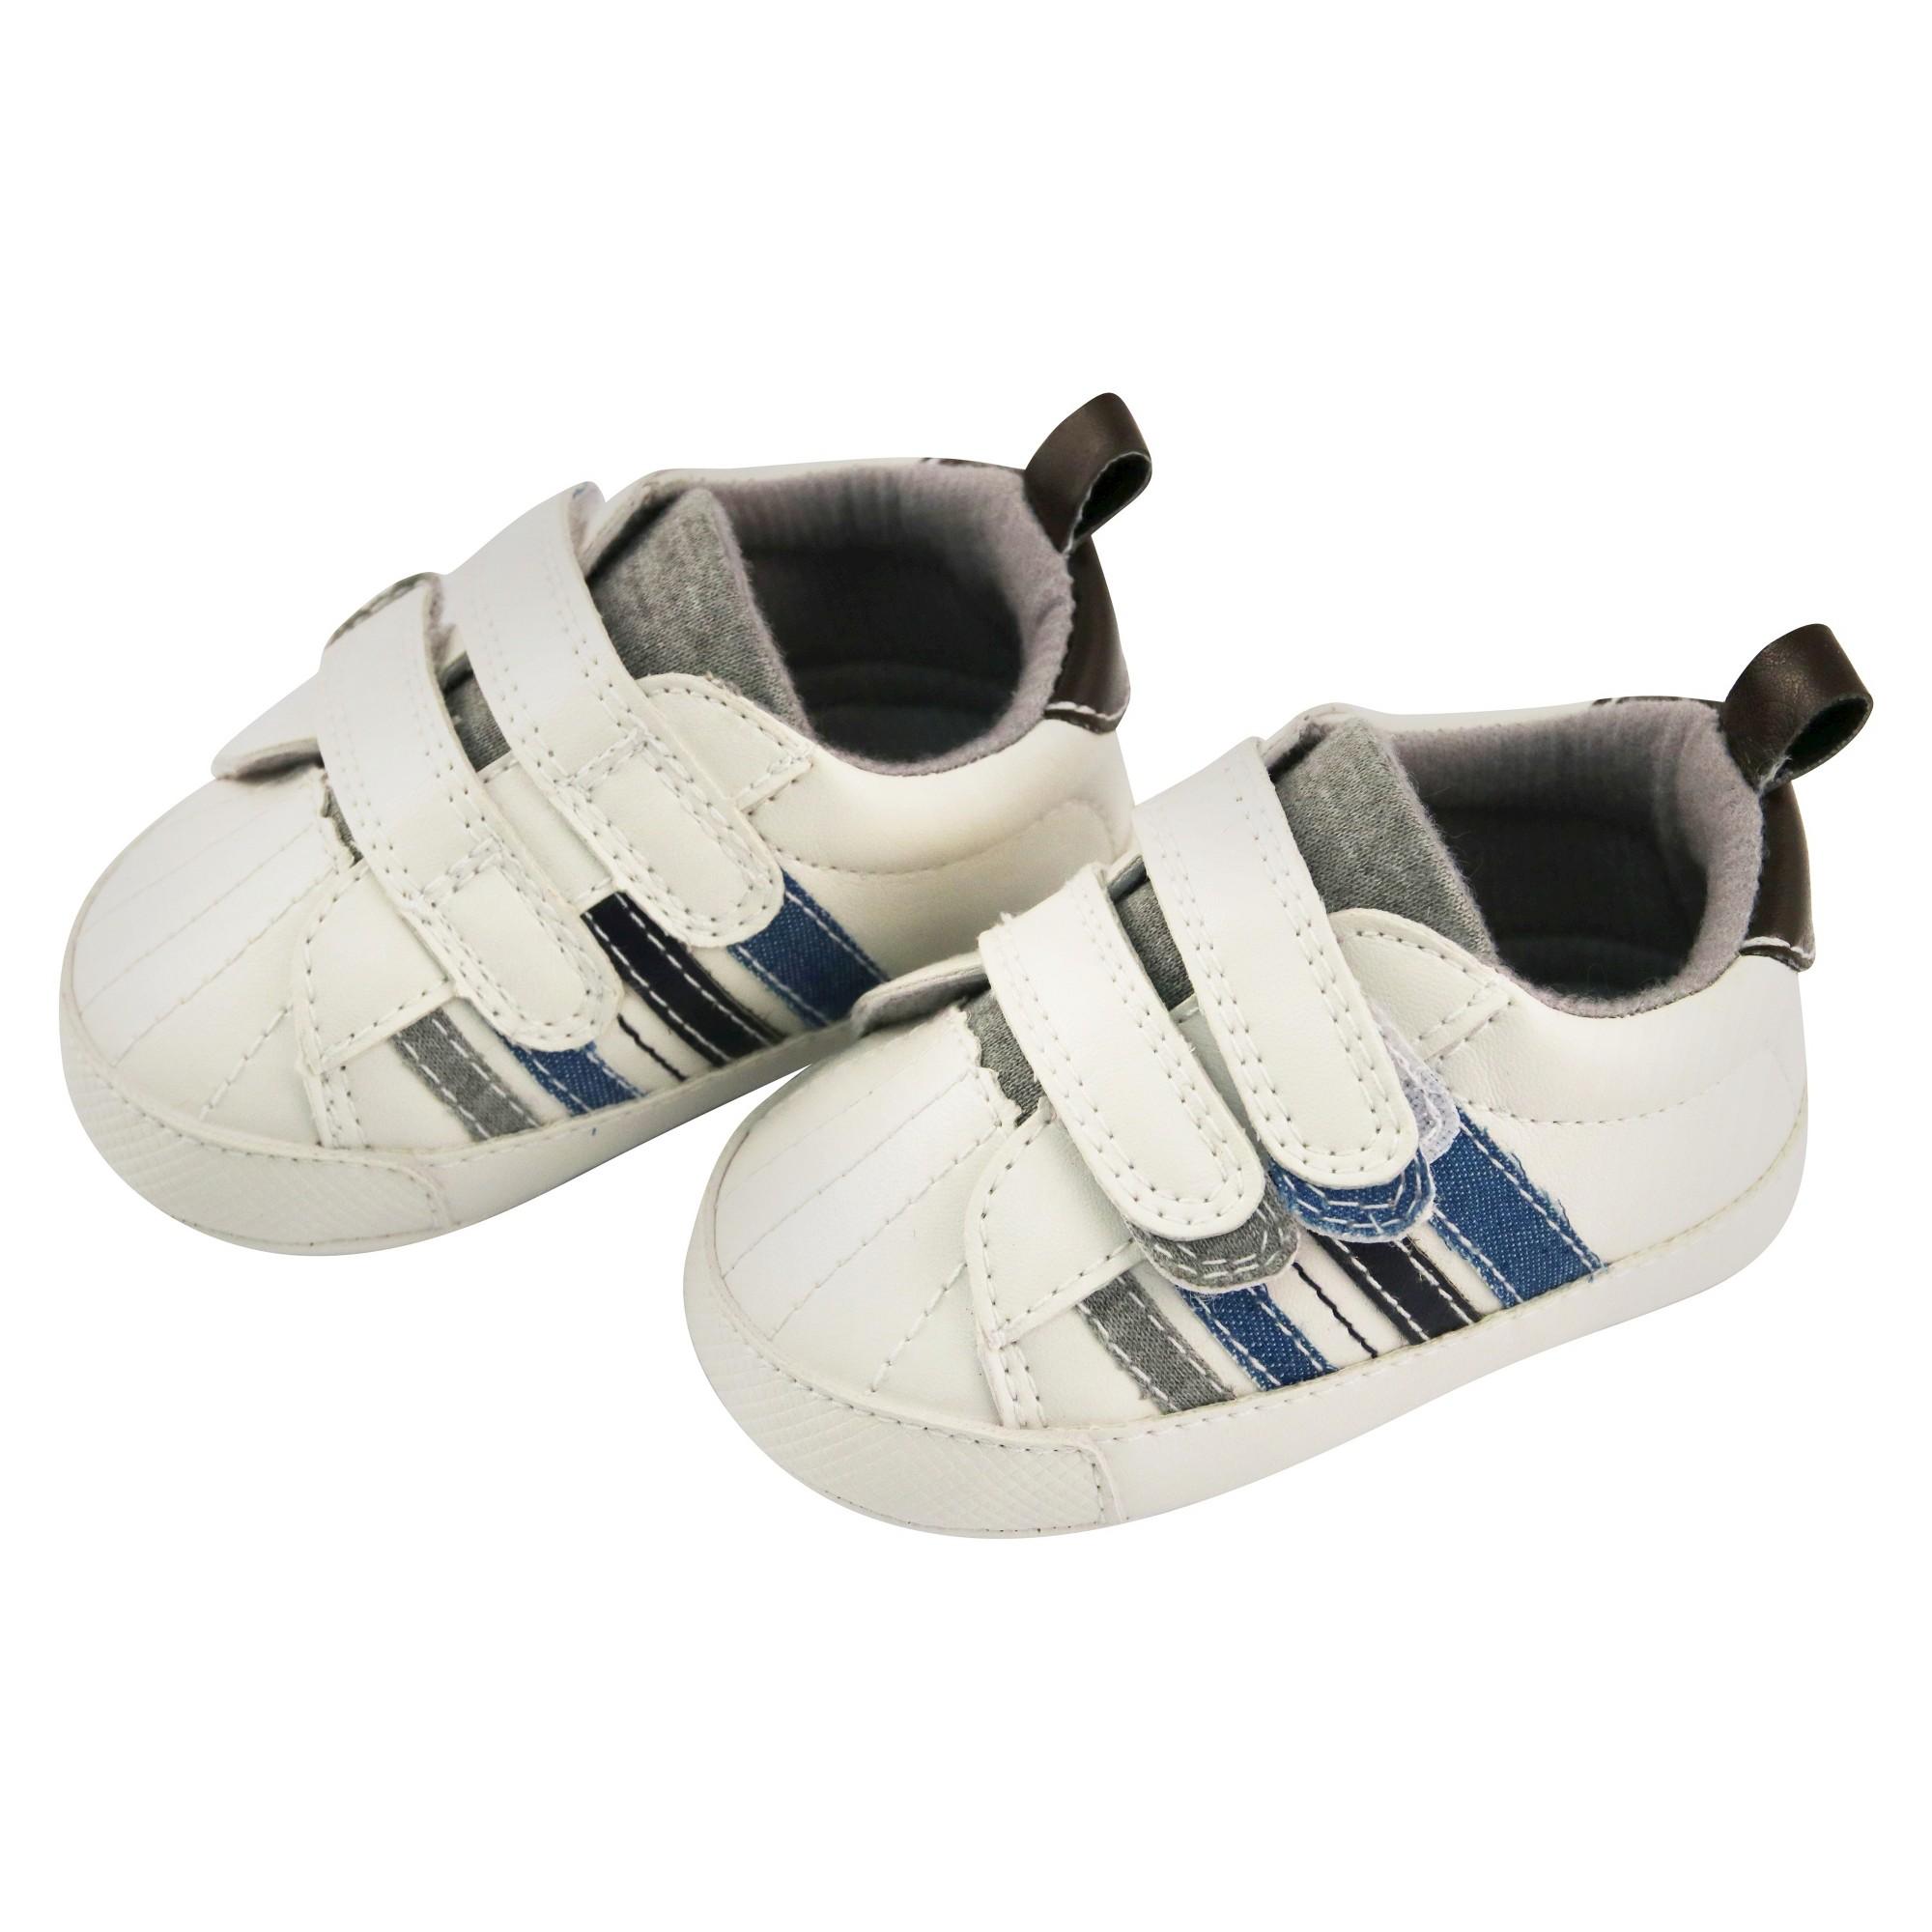 Baby Boys Rising Star Velcro Crib Shoes White 9 12M